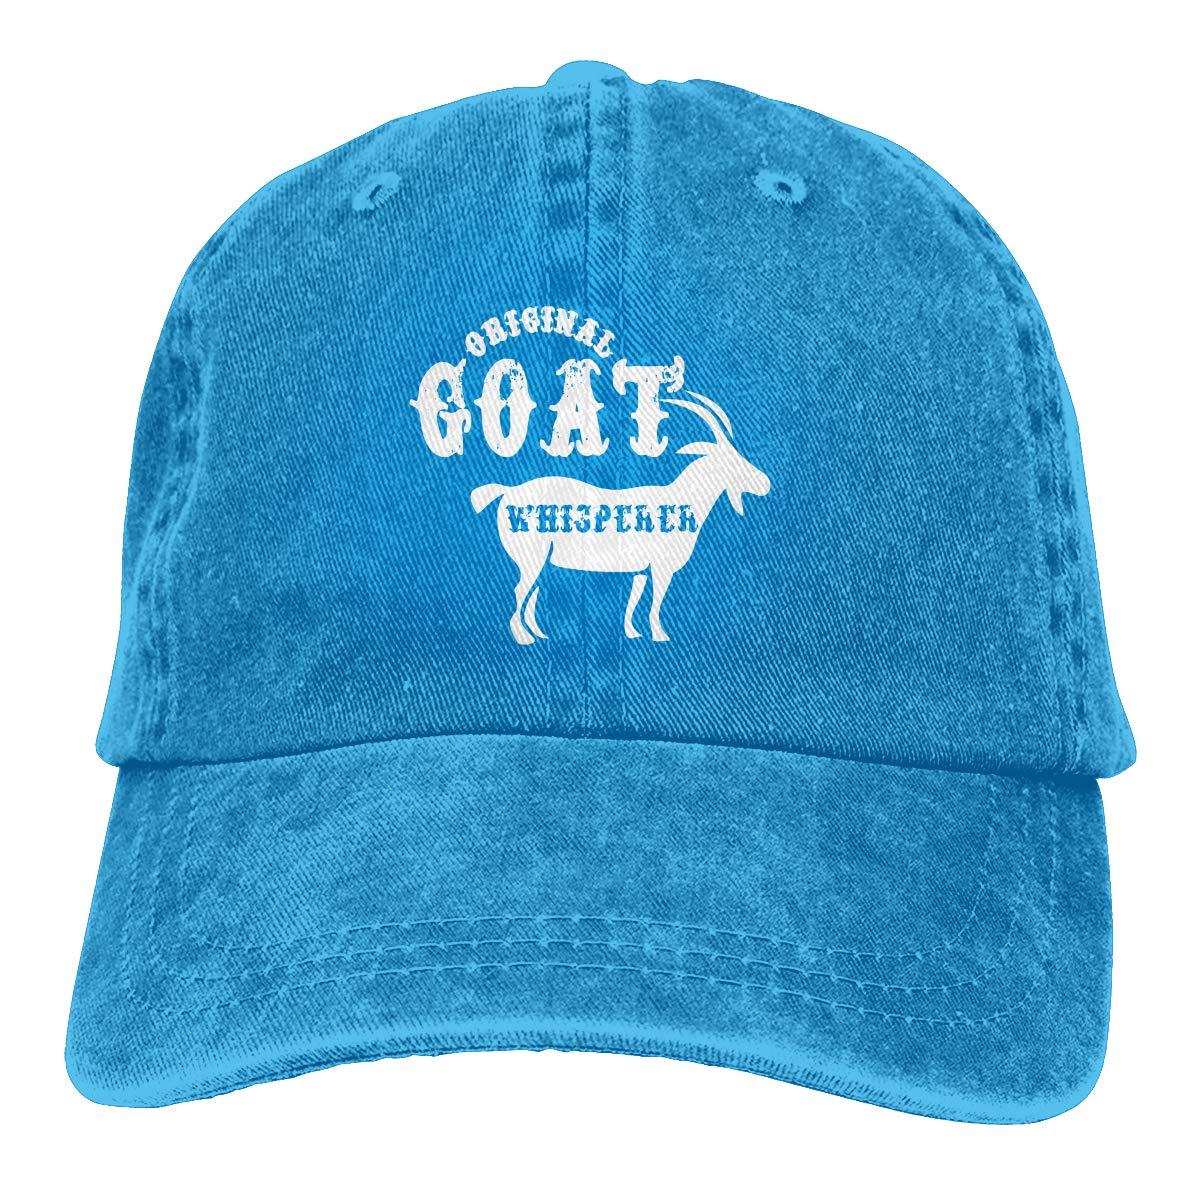 Original Goat Whisperer Fashion Adjustable Cowboy Cap Baseball Cap for Women and Men